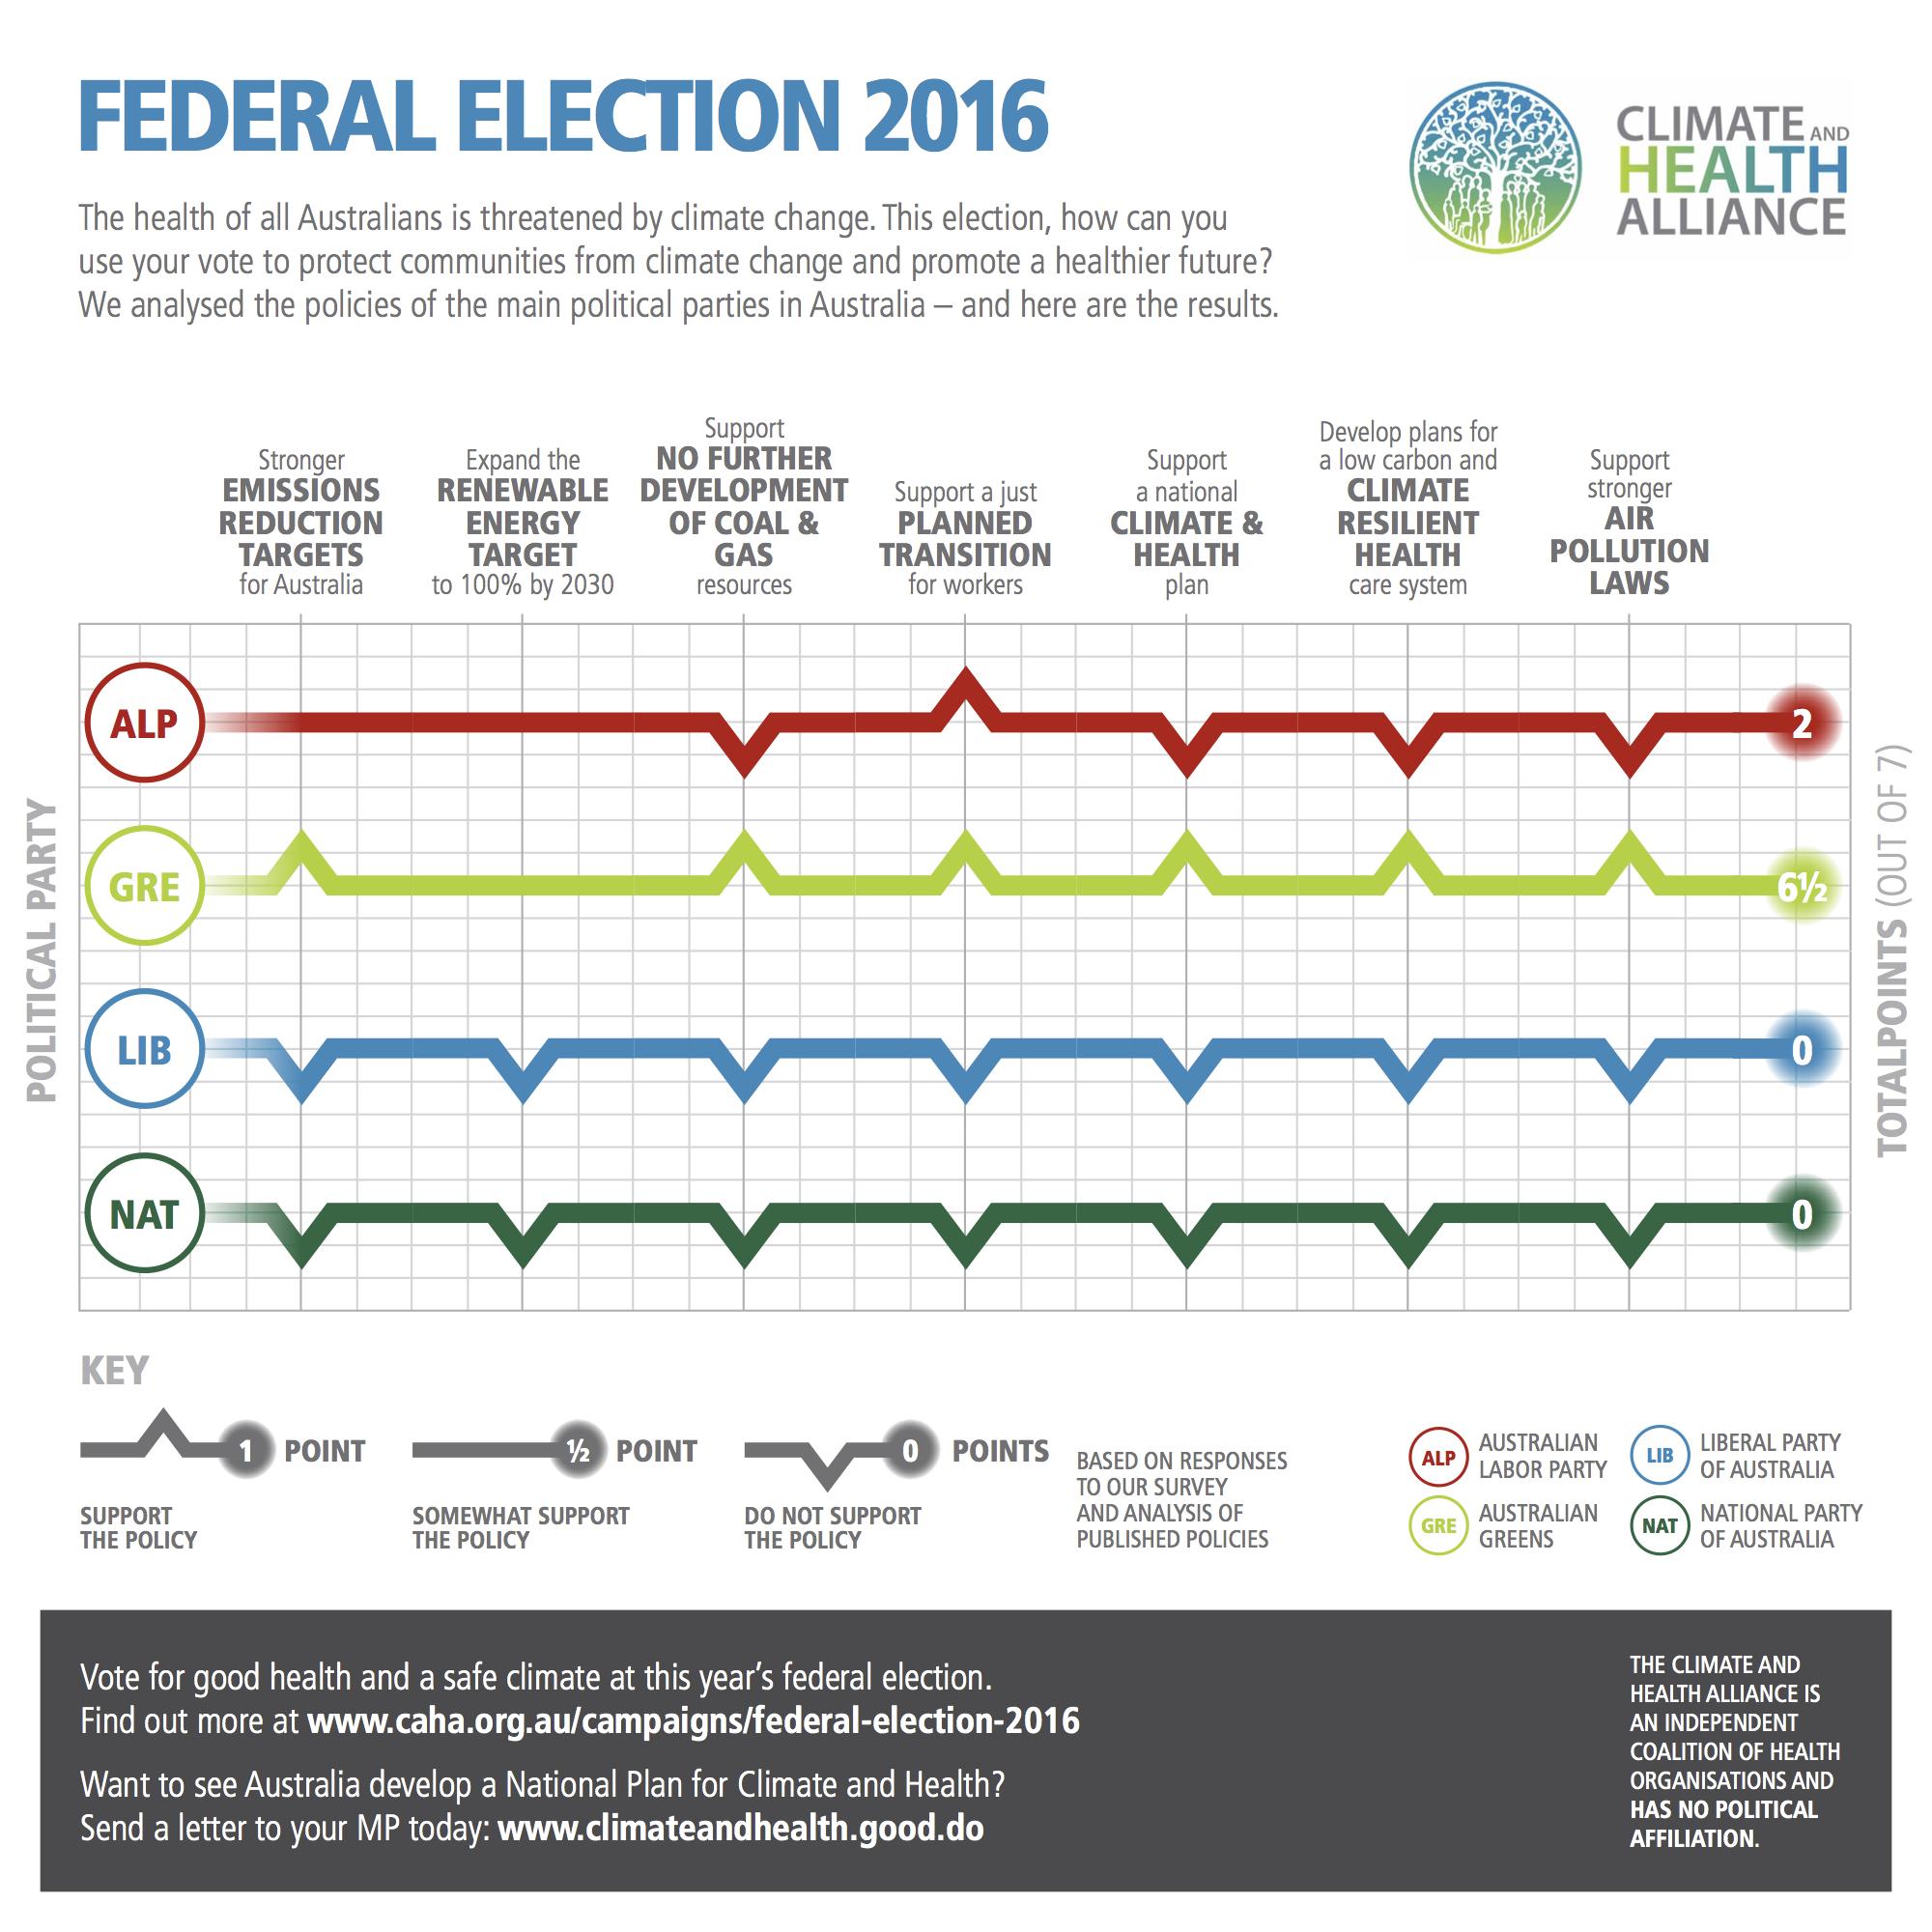 CAHA 2016 Election Scorecard v02